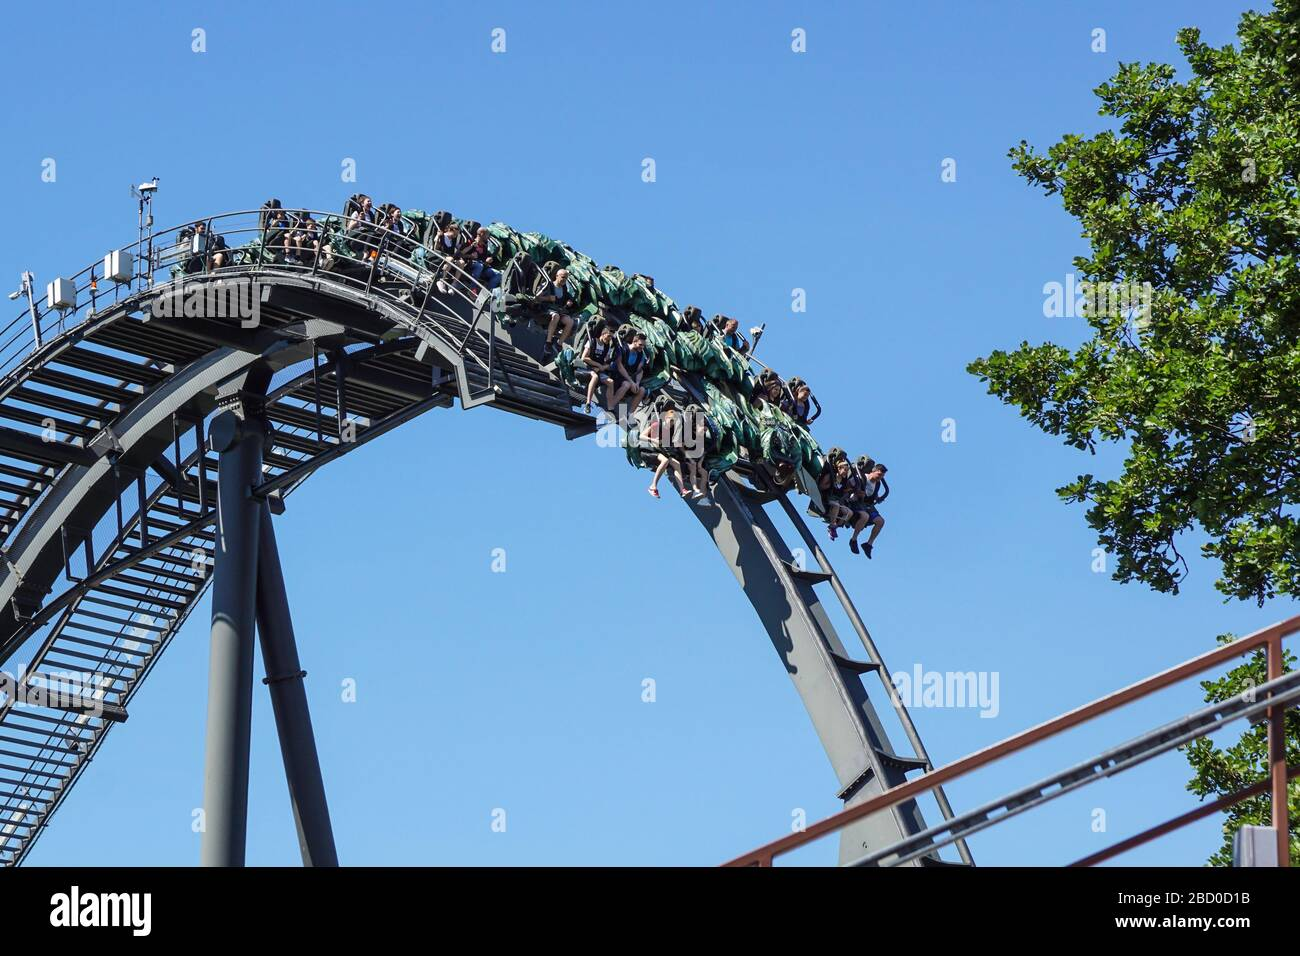 Gardaland, italy 20 june 2019 . Young people screaming during a ride at roller coaster Gardaland park . Stock Photo